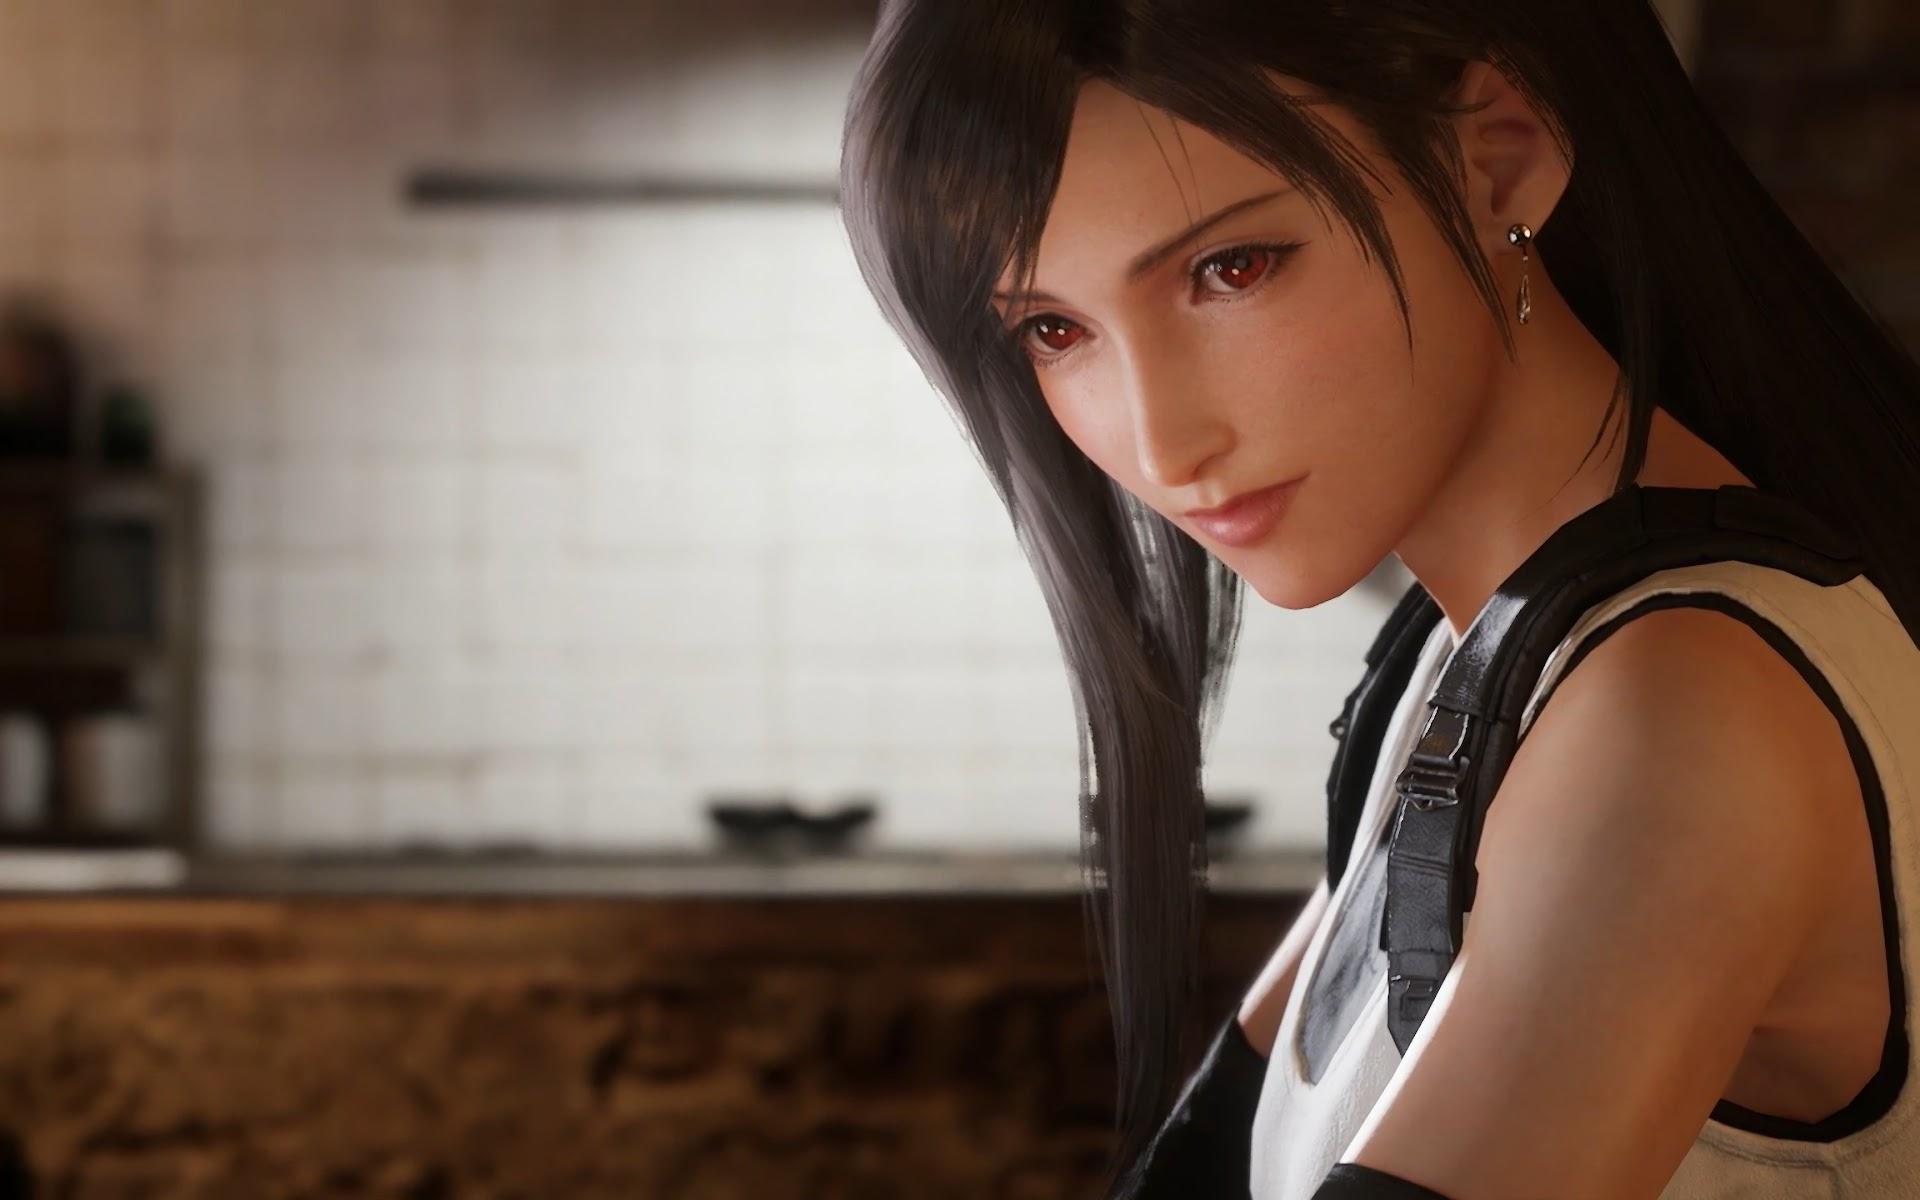 Tifa Lockhart, Final Fantasy 7 Remake, 4K, #18 Wallpaper